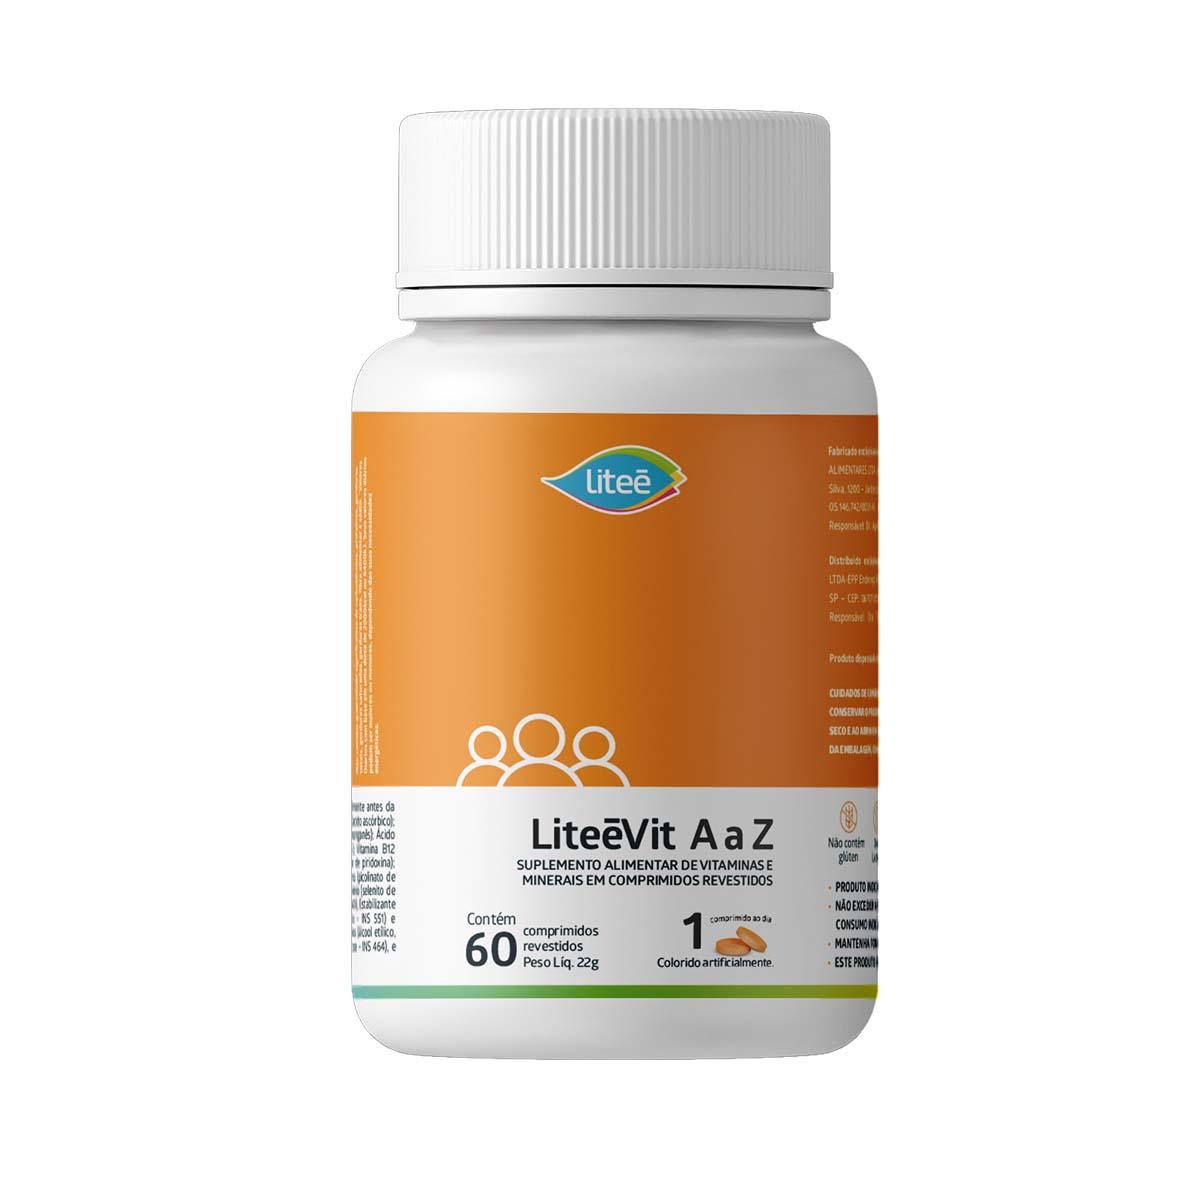 Multivitamínico LiteéVit de A a Z com 60 Comprimidos